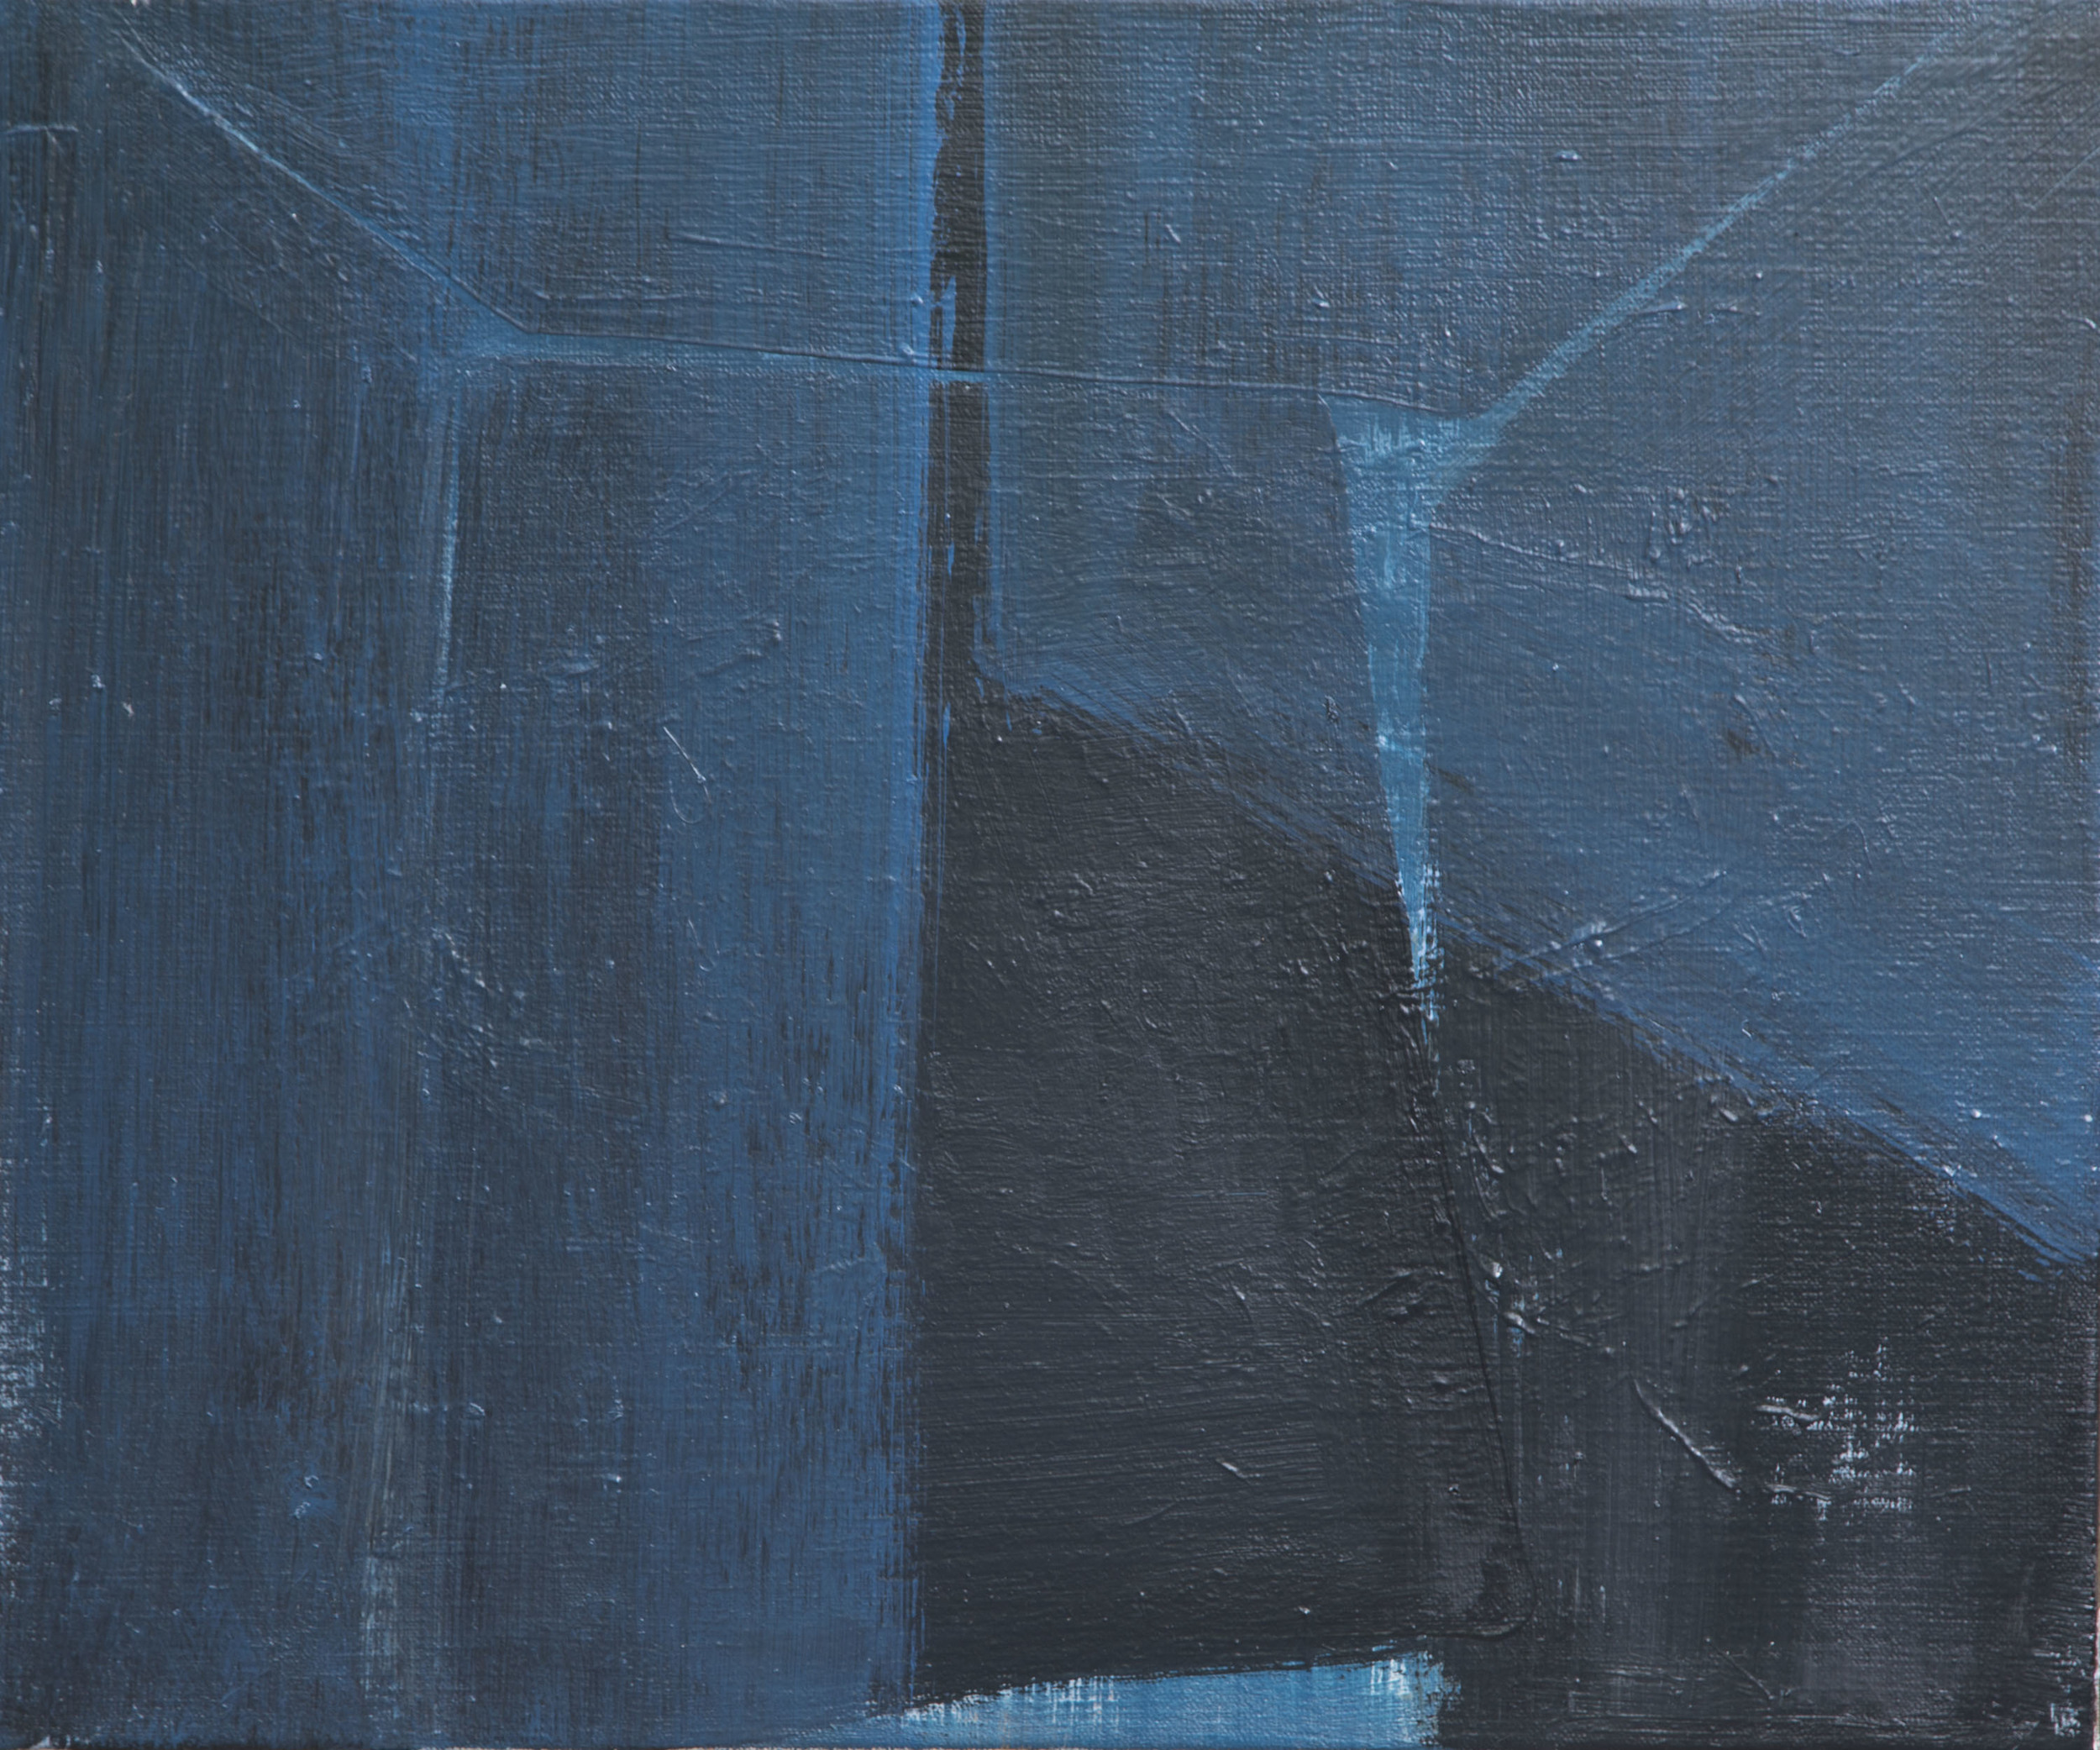 2015, 40x50 cm, oil on canvas